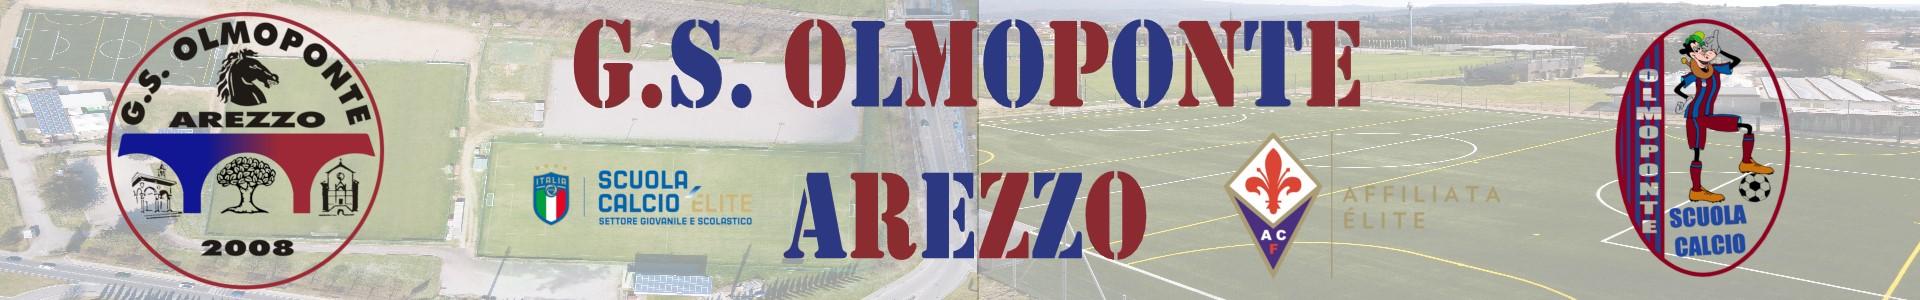 G.S. OLMOPONTE AREZZO A.S.D.